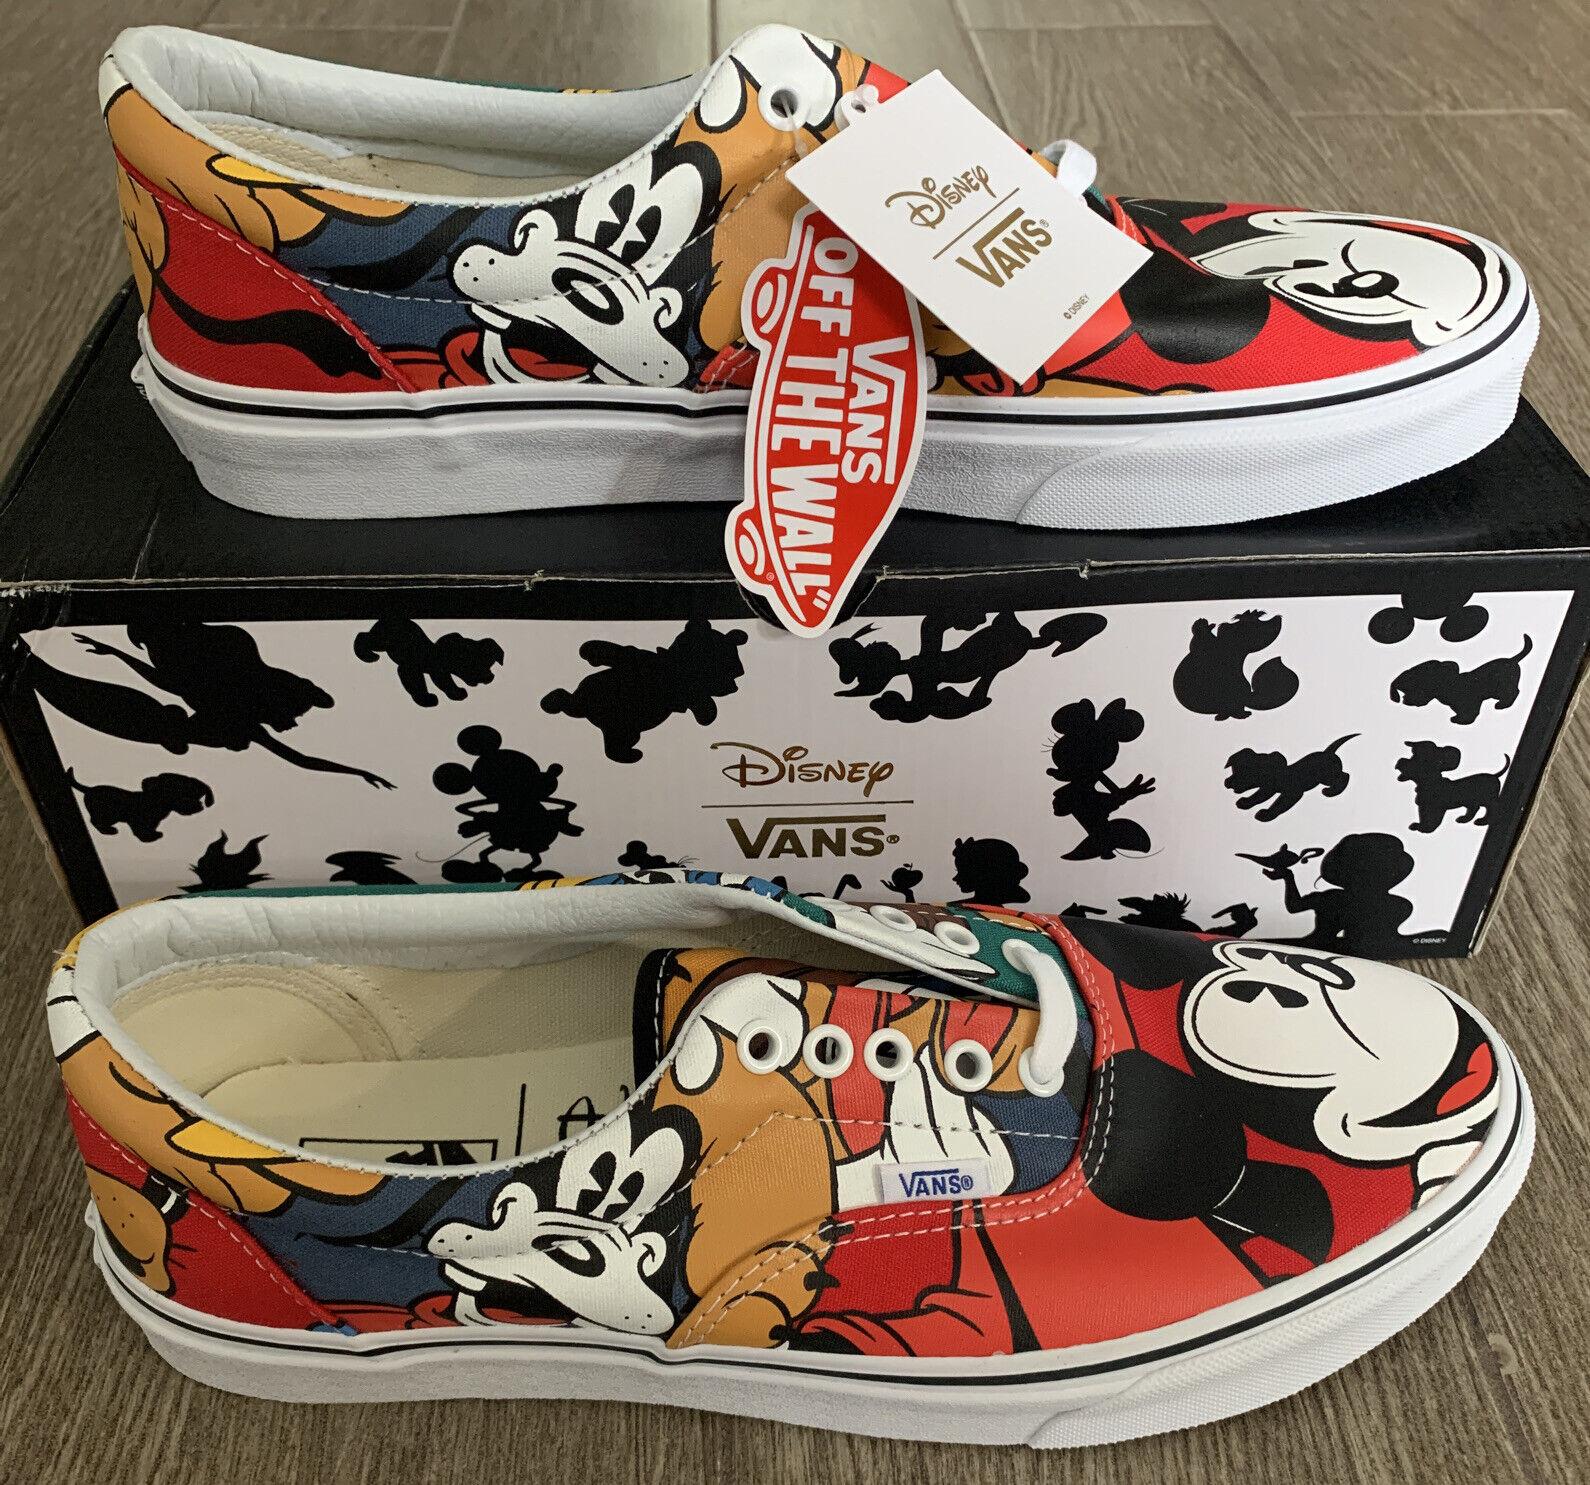 Vans X Disney Mickey \u0026 Friends Size 10